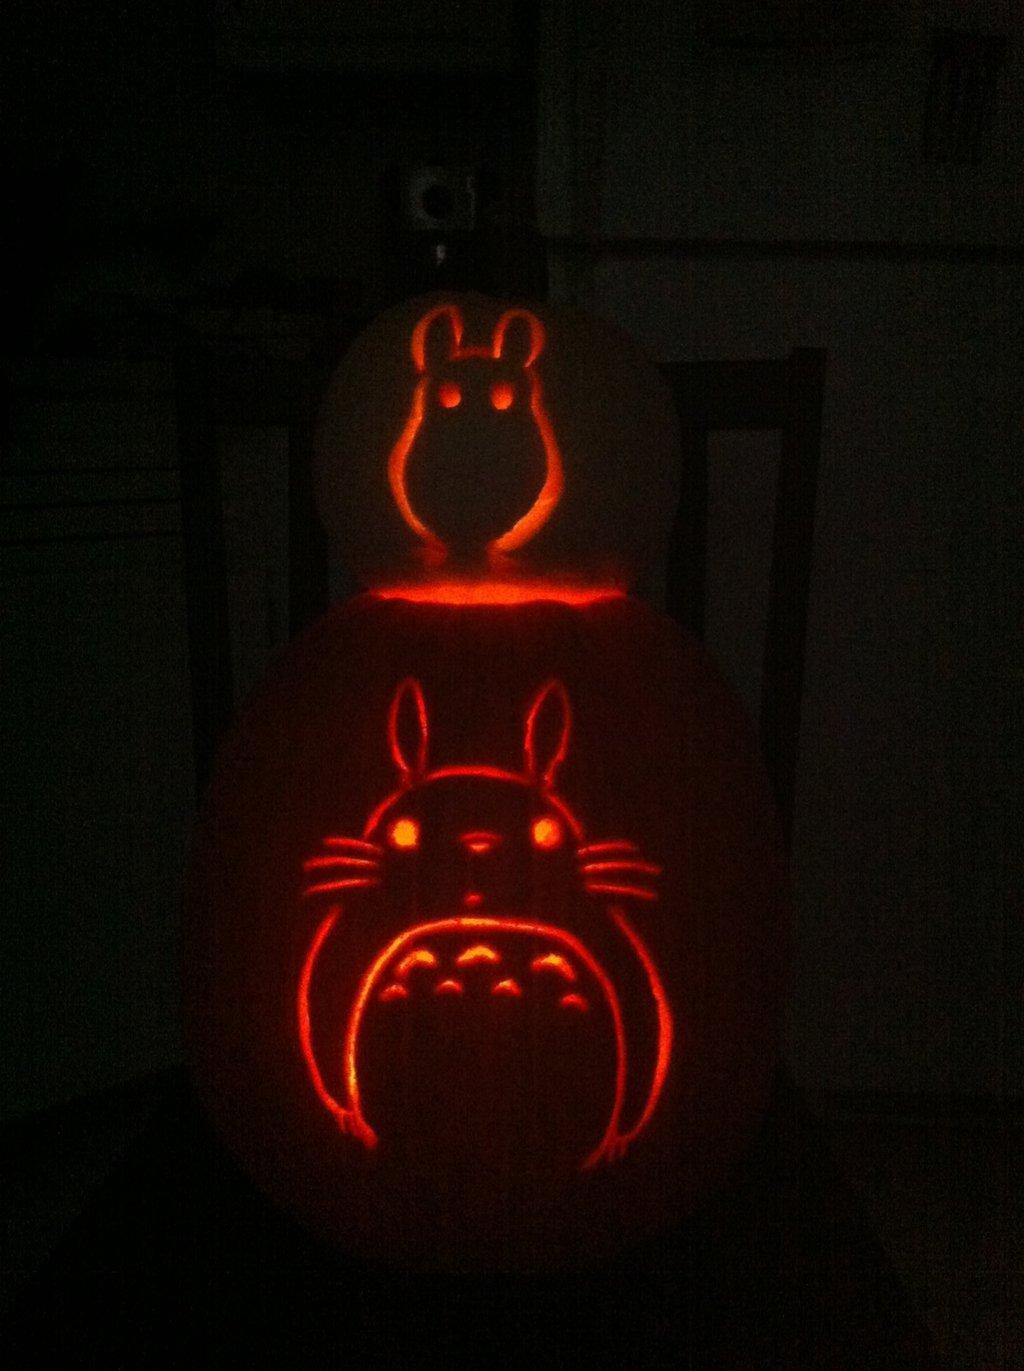 Totoro Pumpkin Pattern totoro Pumpkins by Pippin Chan On Deviantart